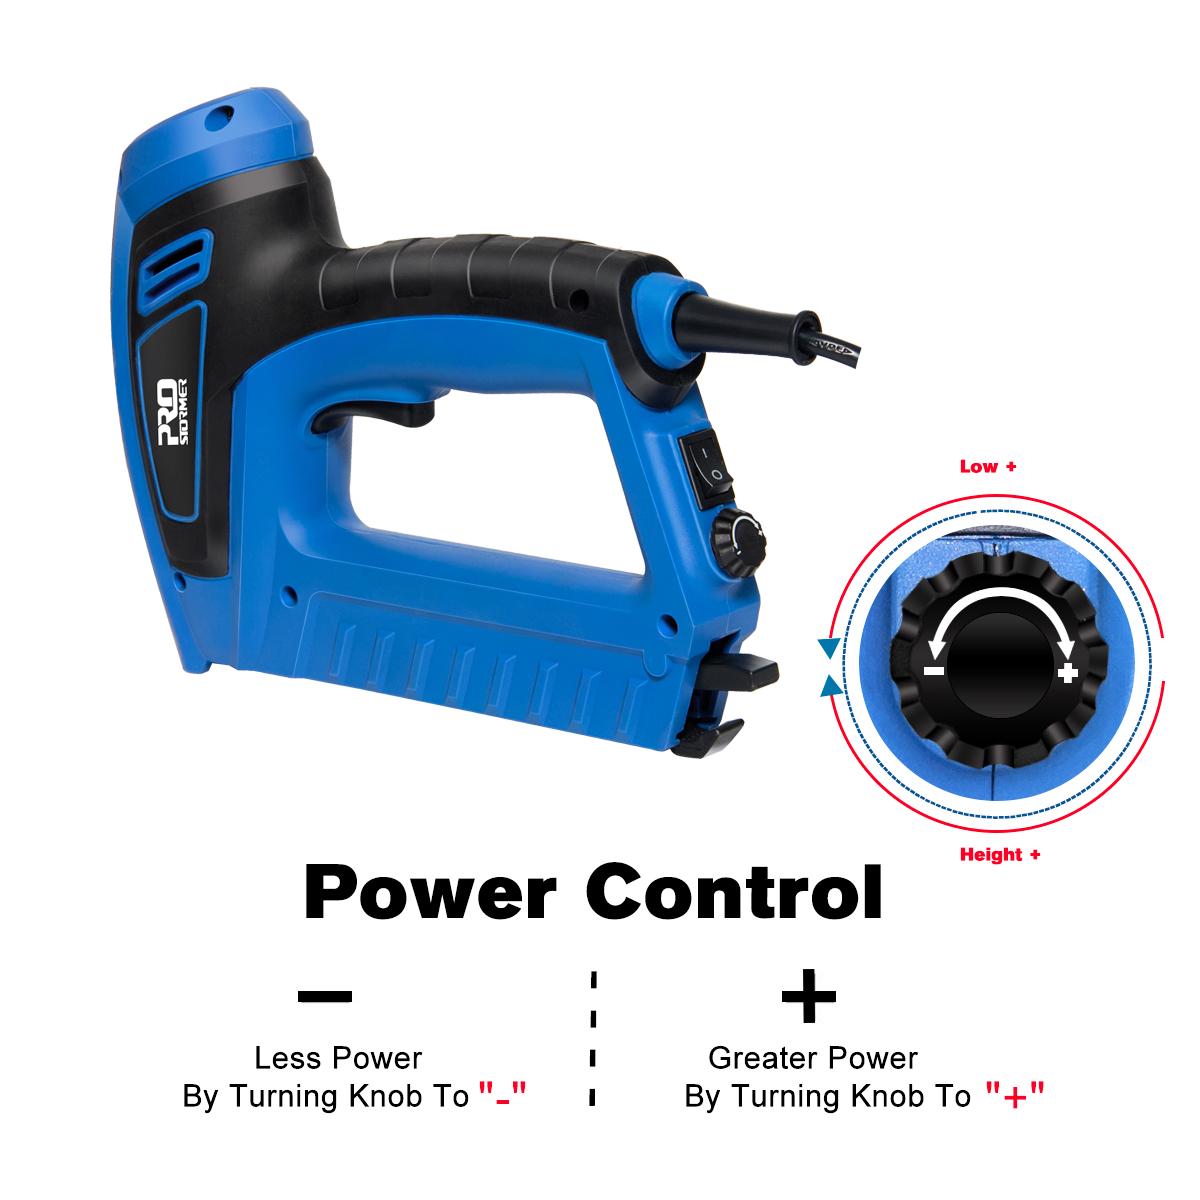 Tools : 2000W Woodworking Eletric Nail Gun 220V Nailer Stapler Straight Door Nail Staplers Portable Electric Tacker Gun by PROSTORMER